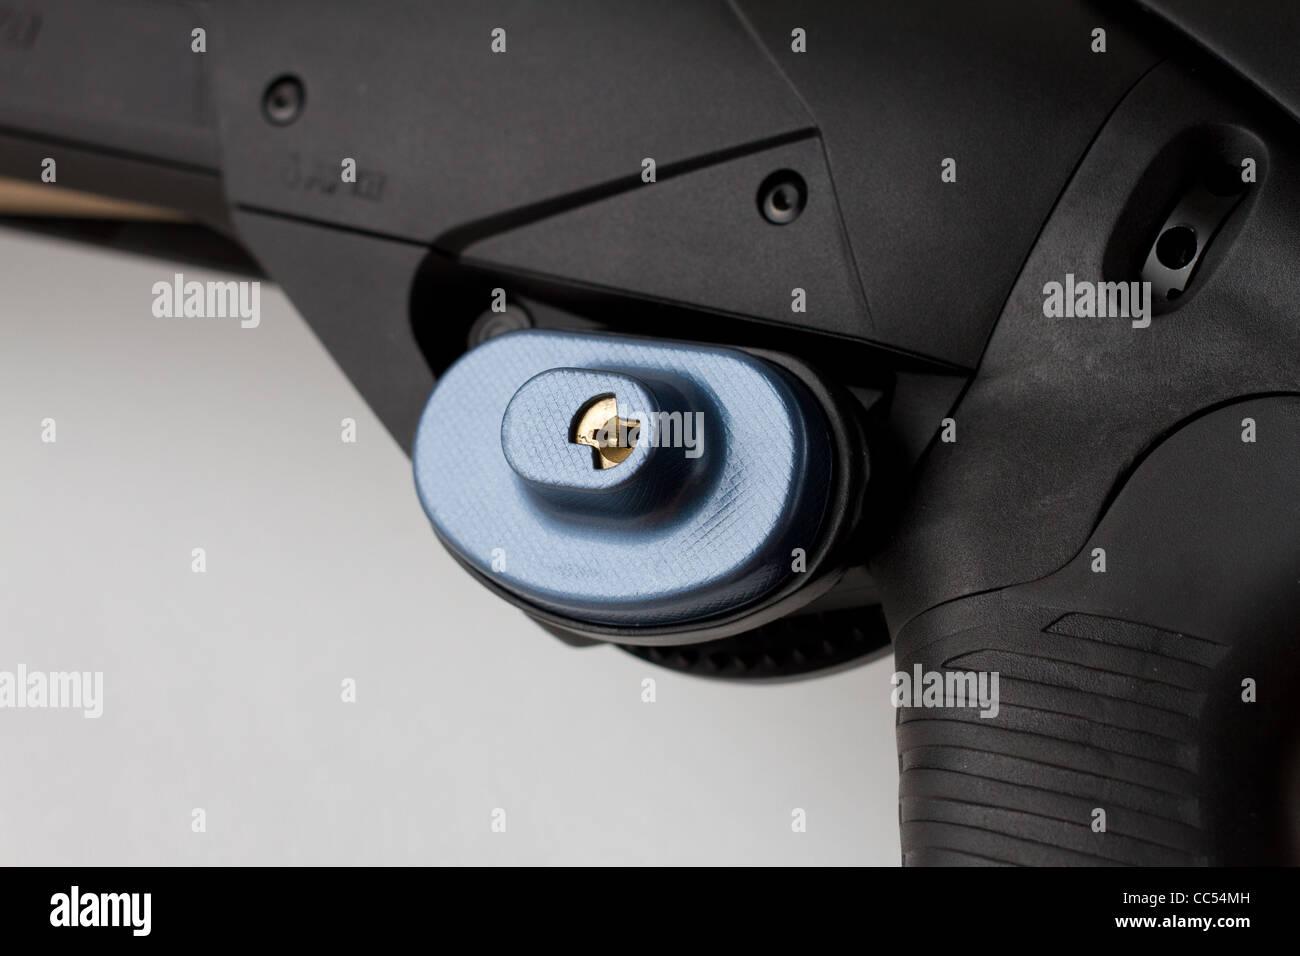 Close-up of shotgun with trigger lock - Stock Image